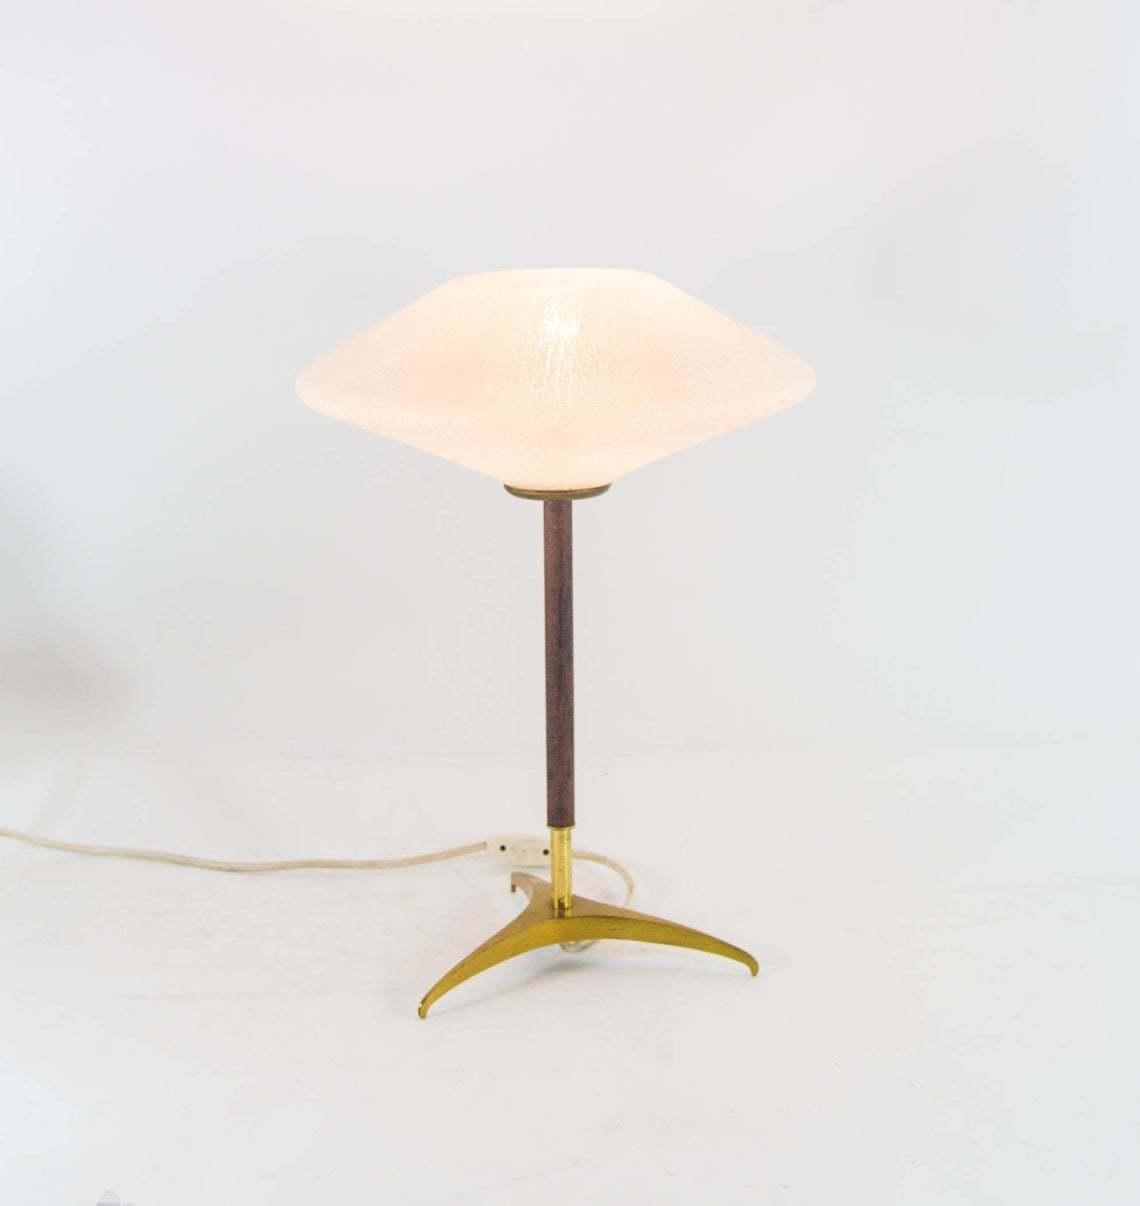 Midcentury Tripod Table Lamp Space Age Design Vintage 60s Louis Kalff Attributed Louis Kalff Vinterior